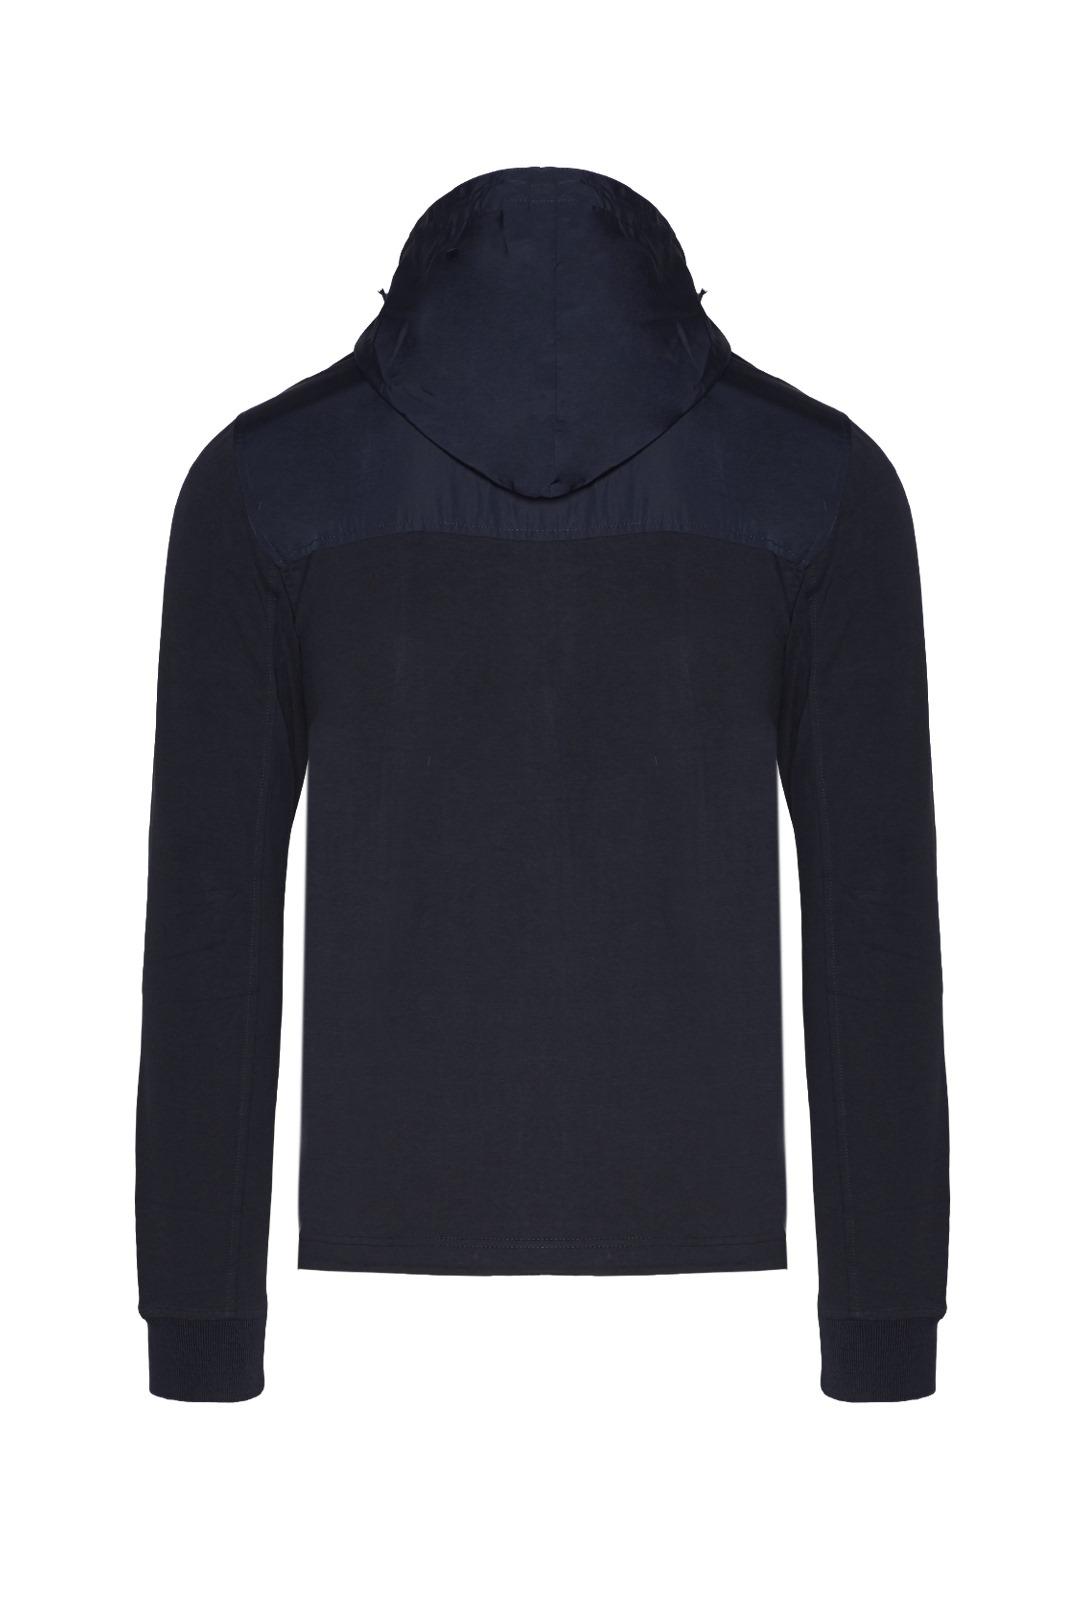 Frecce Tricolori fleece jacket           2